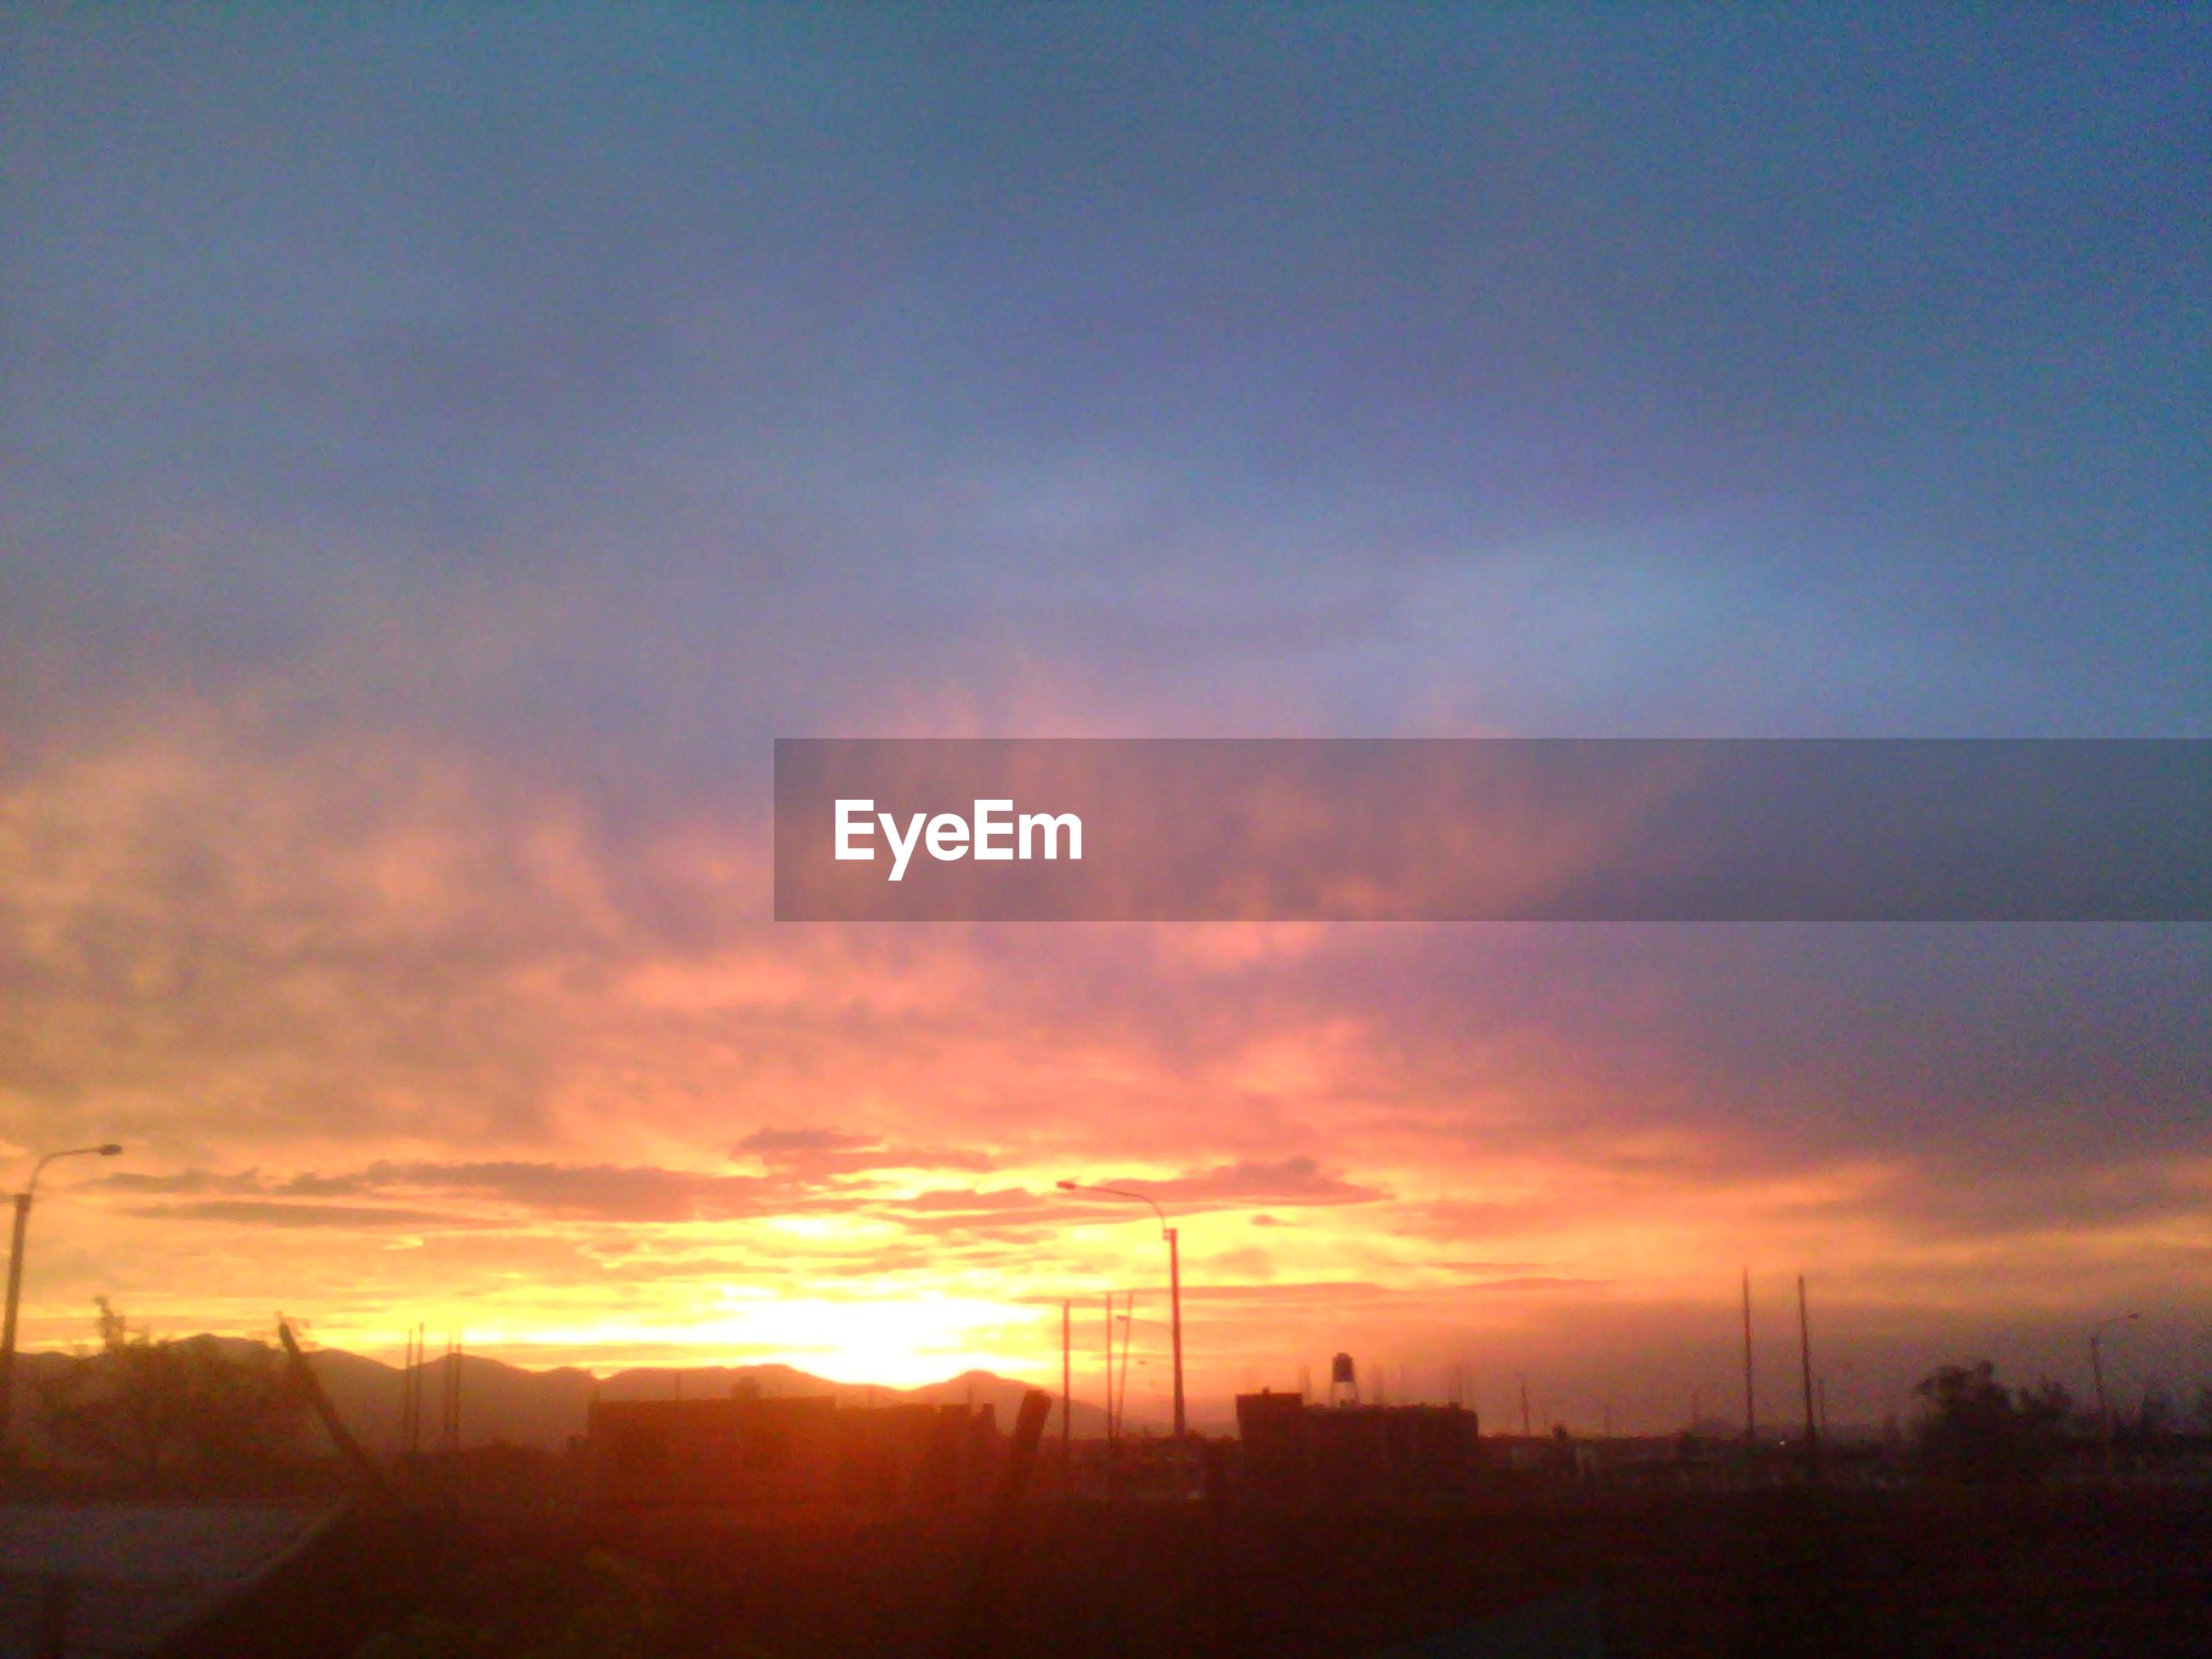 sunset, silhouette, sky, scenics, orange color, tranquil scene, tranquility, beauty in nature, landscape, nature, cloud - sky, idyllic, sun, cloud, field, sunlight, dramatic sky, outdoors, no people, non-urban scene